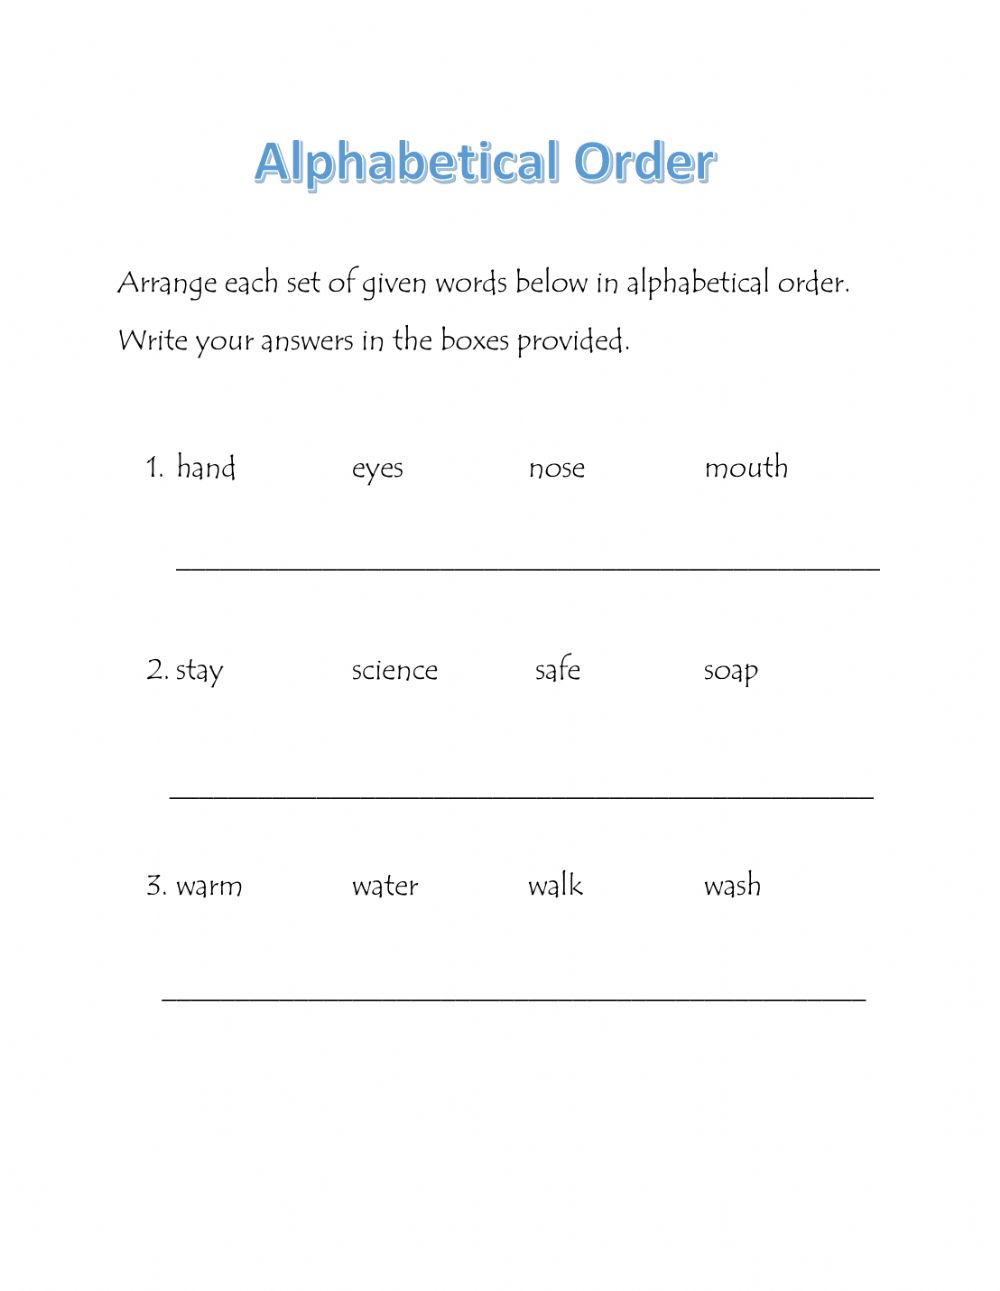 Alphabetical Order - Interactive Worksheet throughout Alphabet Order Worksheets Pdf